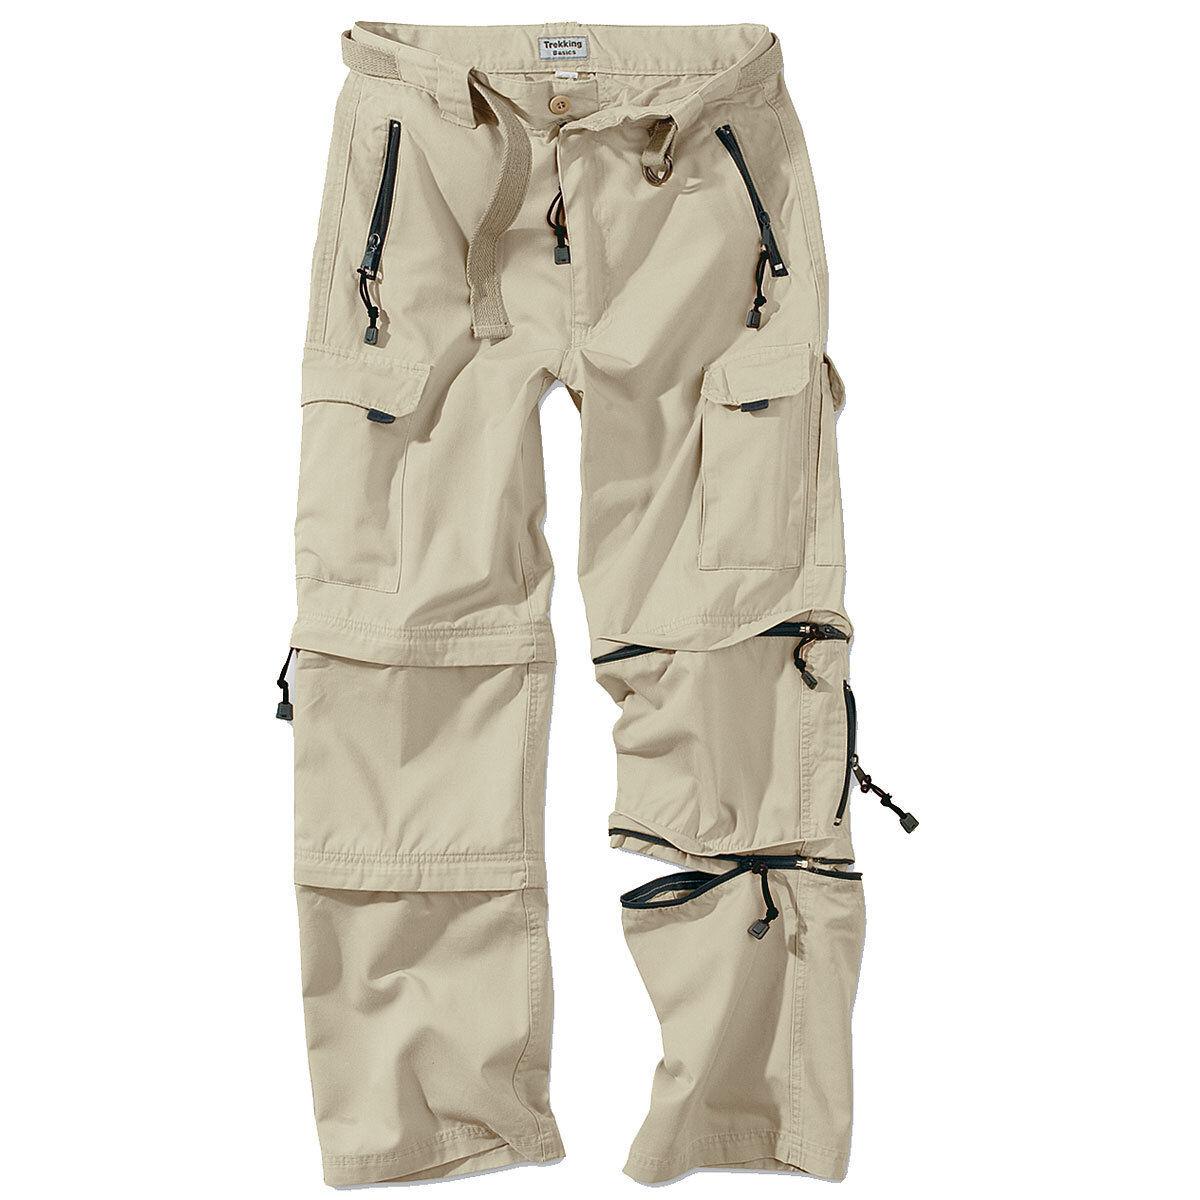 Surplus Trekking Pantaloni Pantaloni Pantaloni Zip S-XXL Tutti i Colorei Esterno Cargo Nuovo 816e16